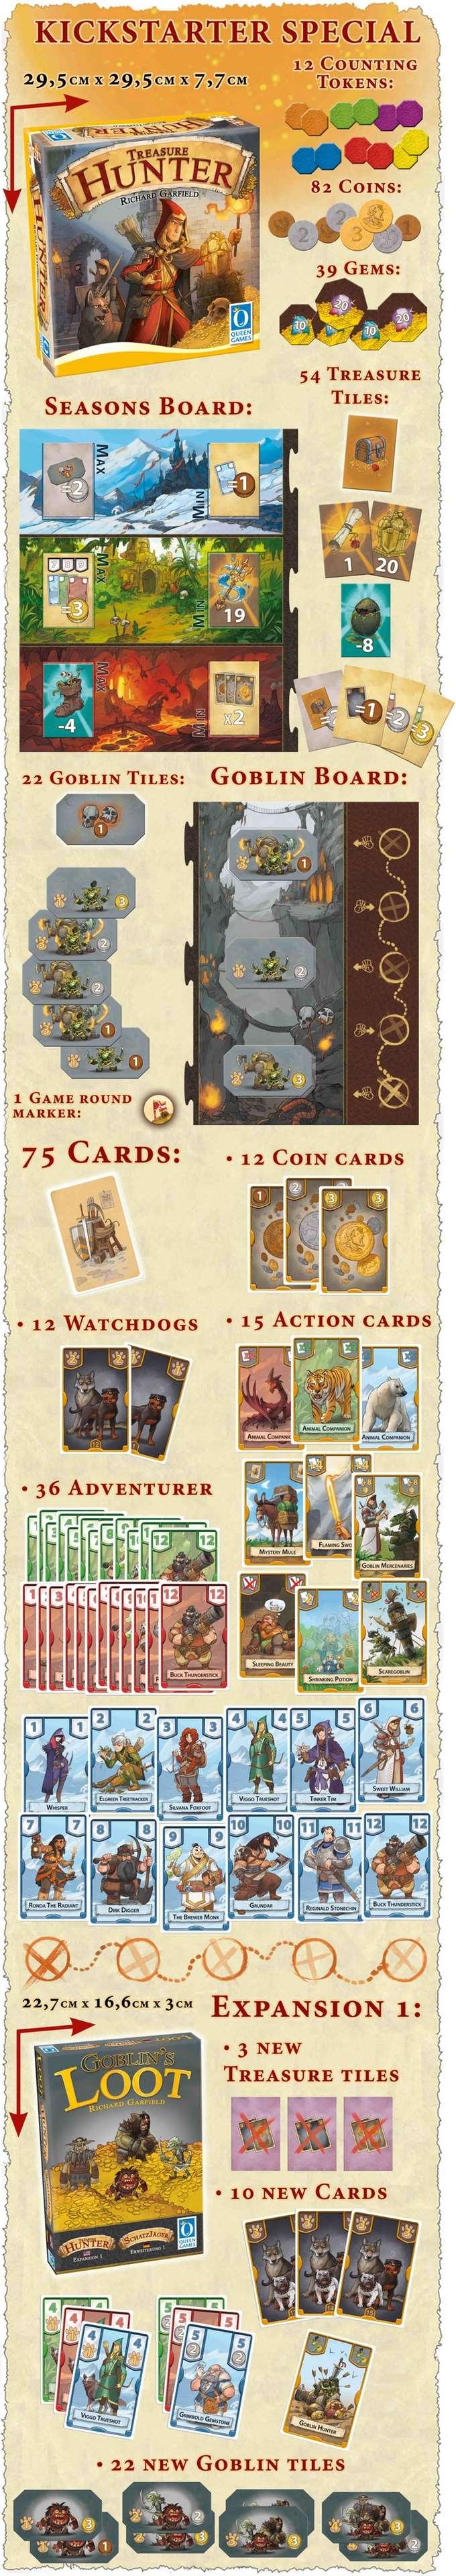 Treasure Hunter Contents